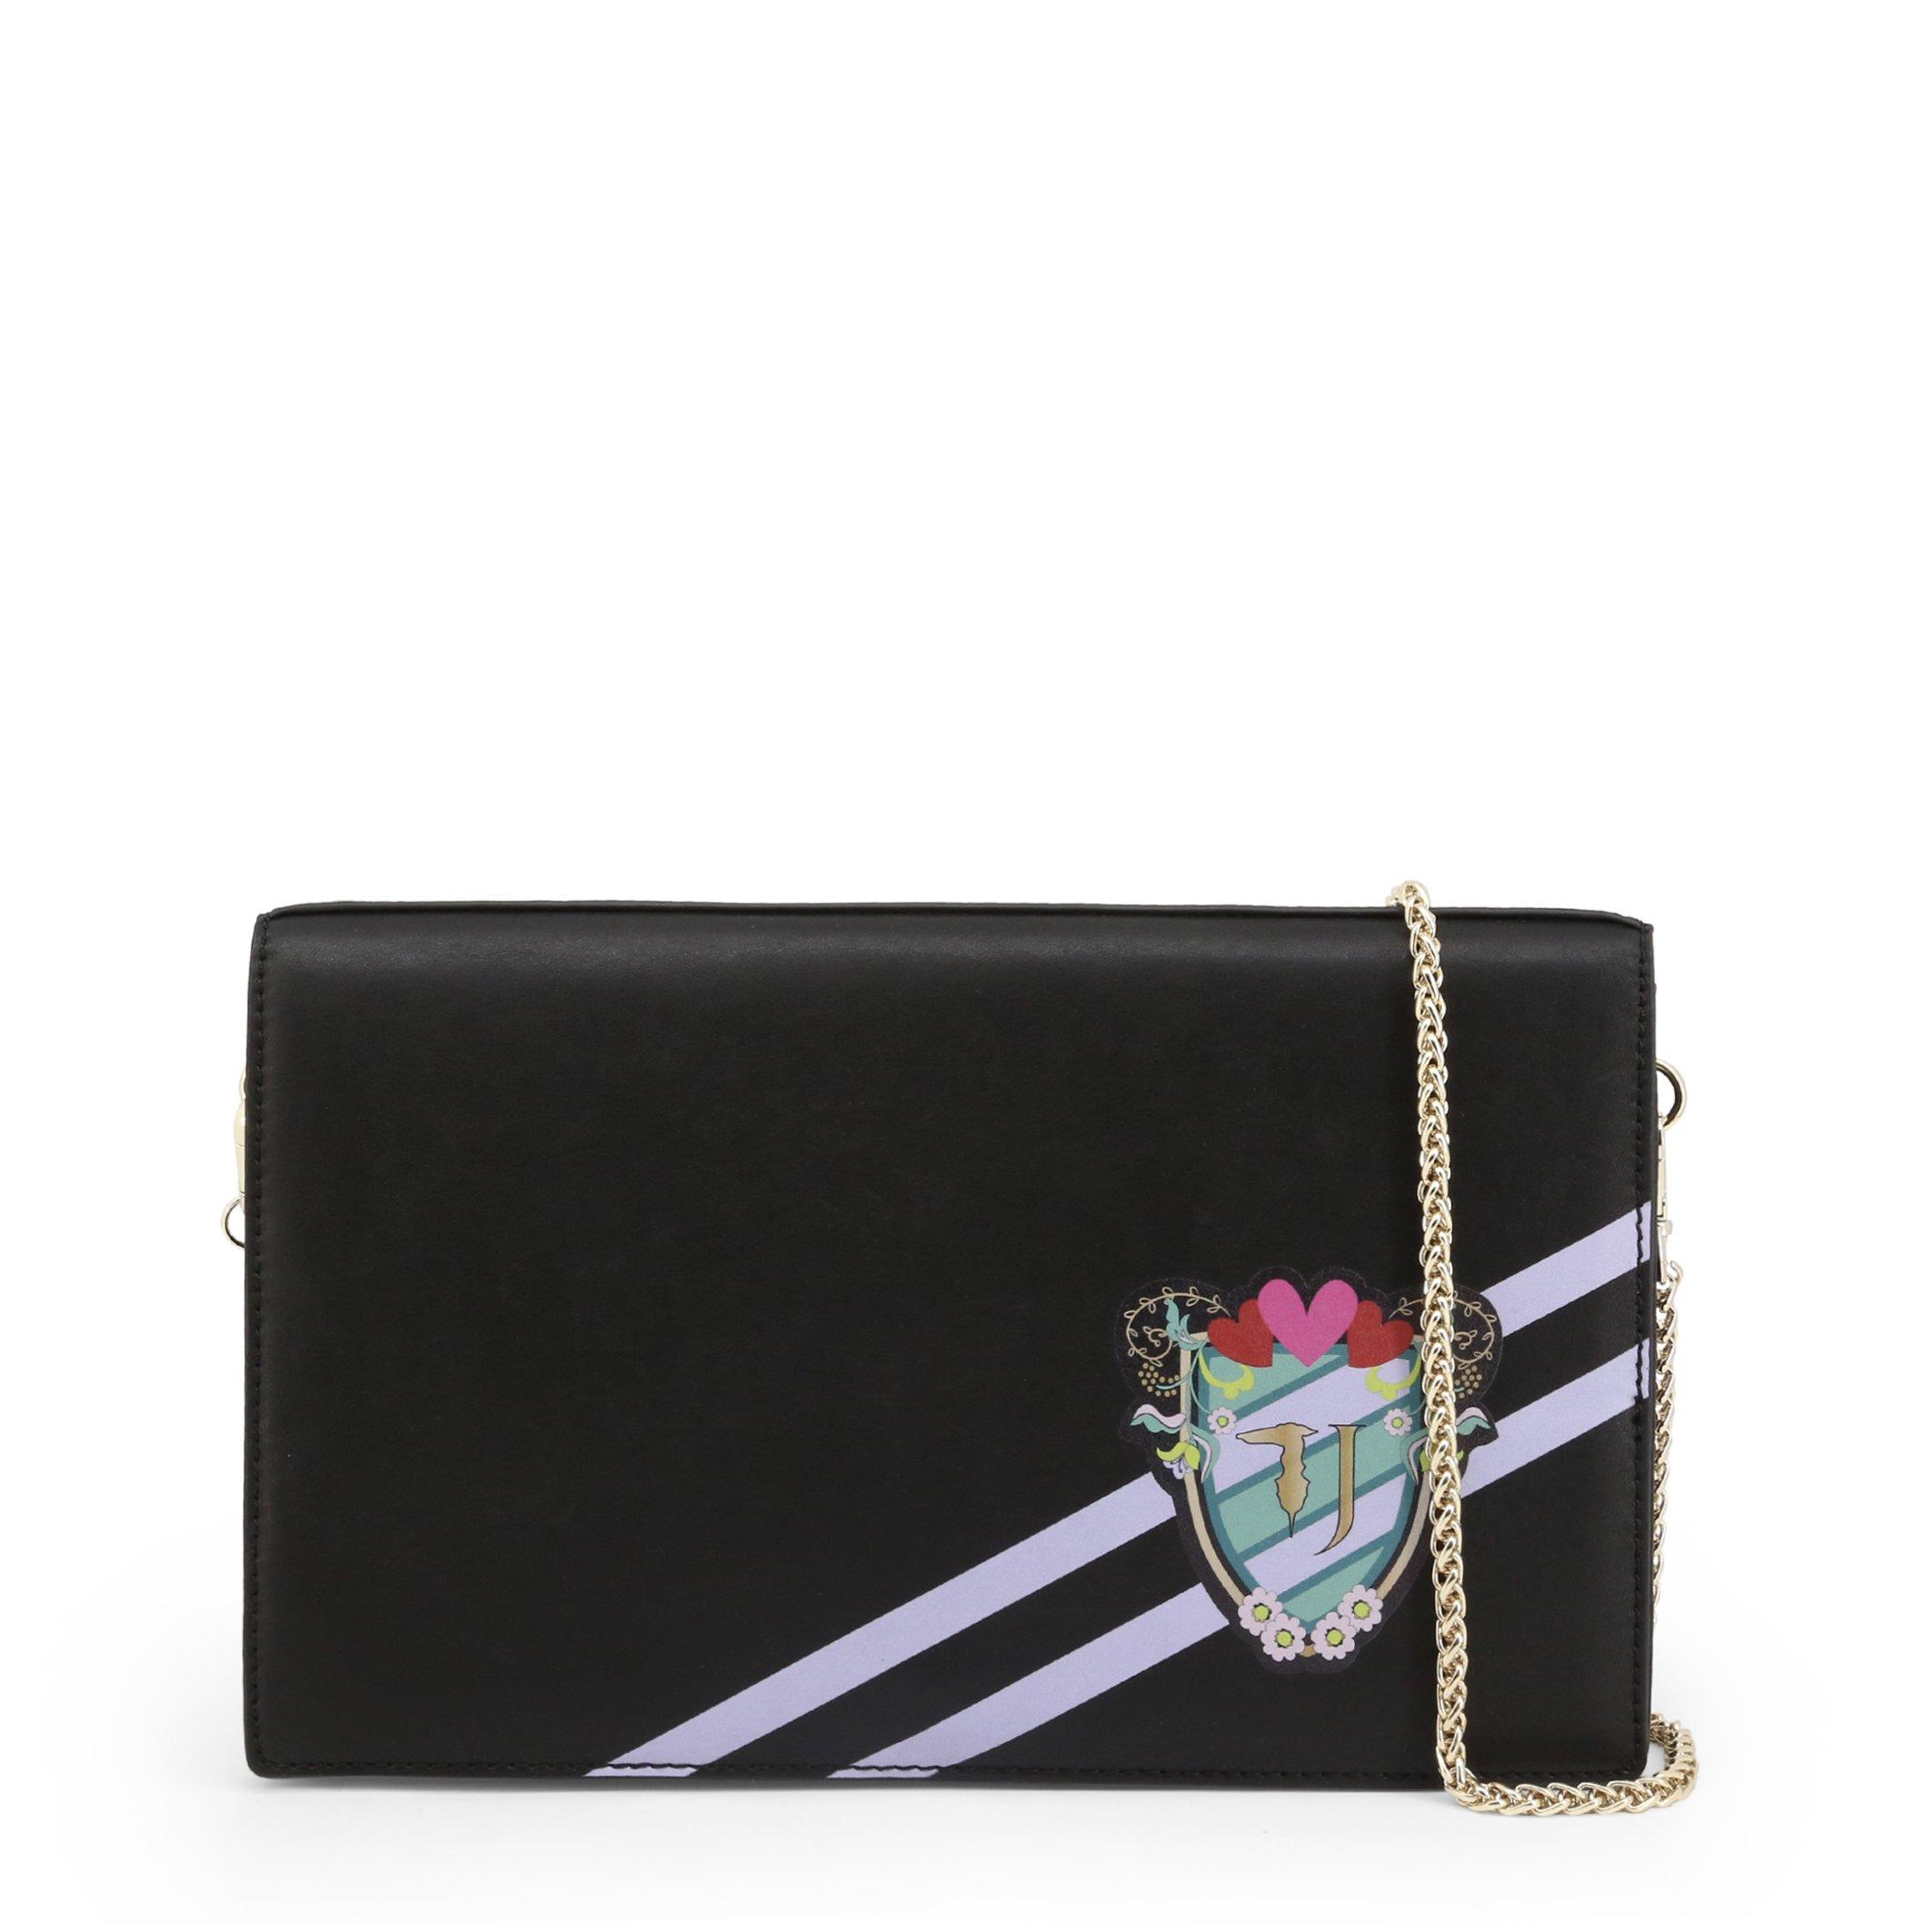 Trussardi Women's Clutch Bag Various Colours CUMINO_75B00413 - black NOSIZE